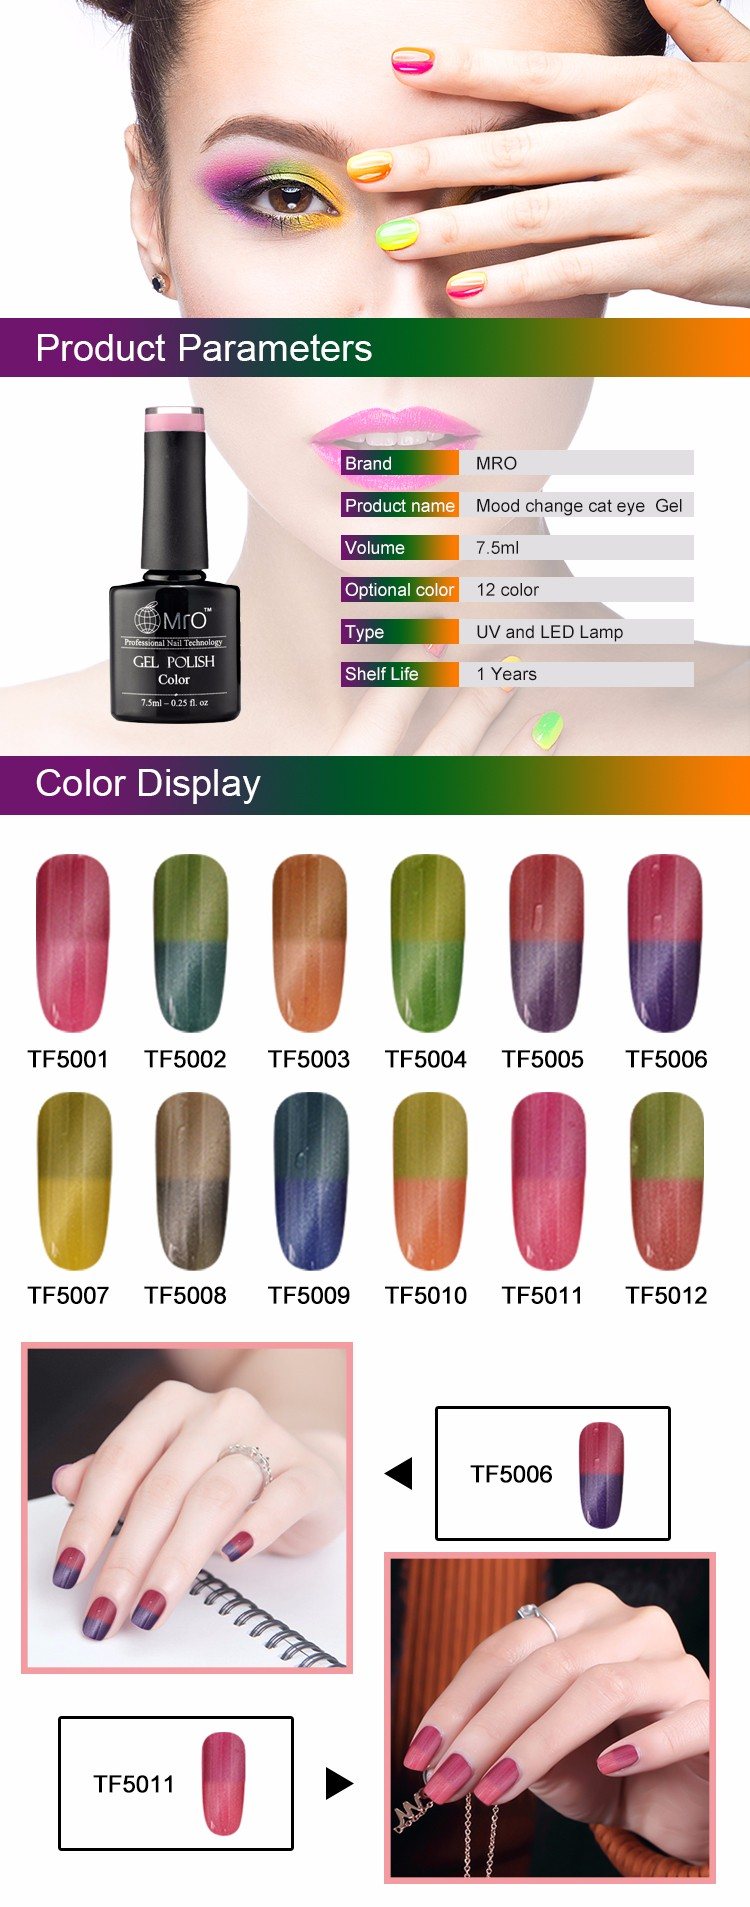 Mood Change Cat Eye Gel 12 Colors Uv Gel Nail Polish Kit - Buy Mood ...